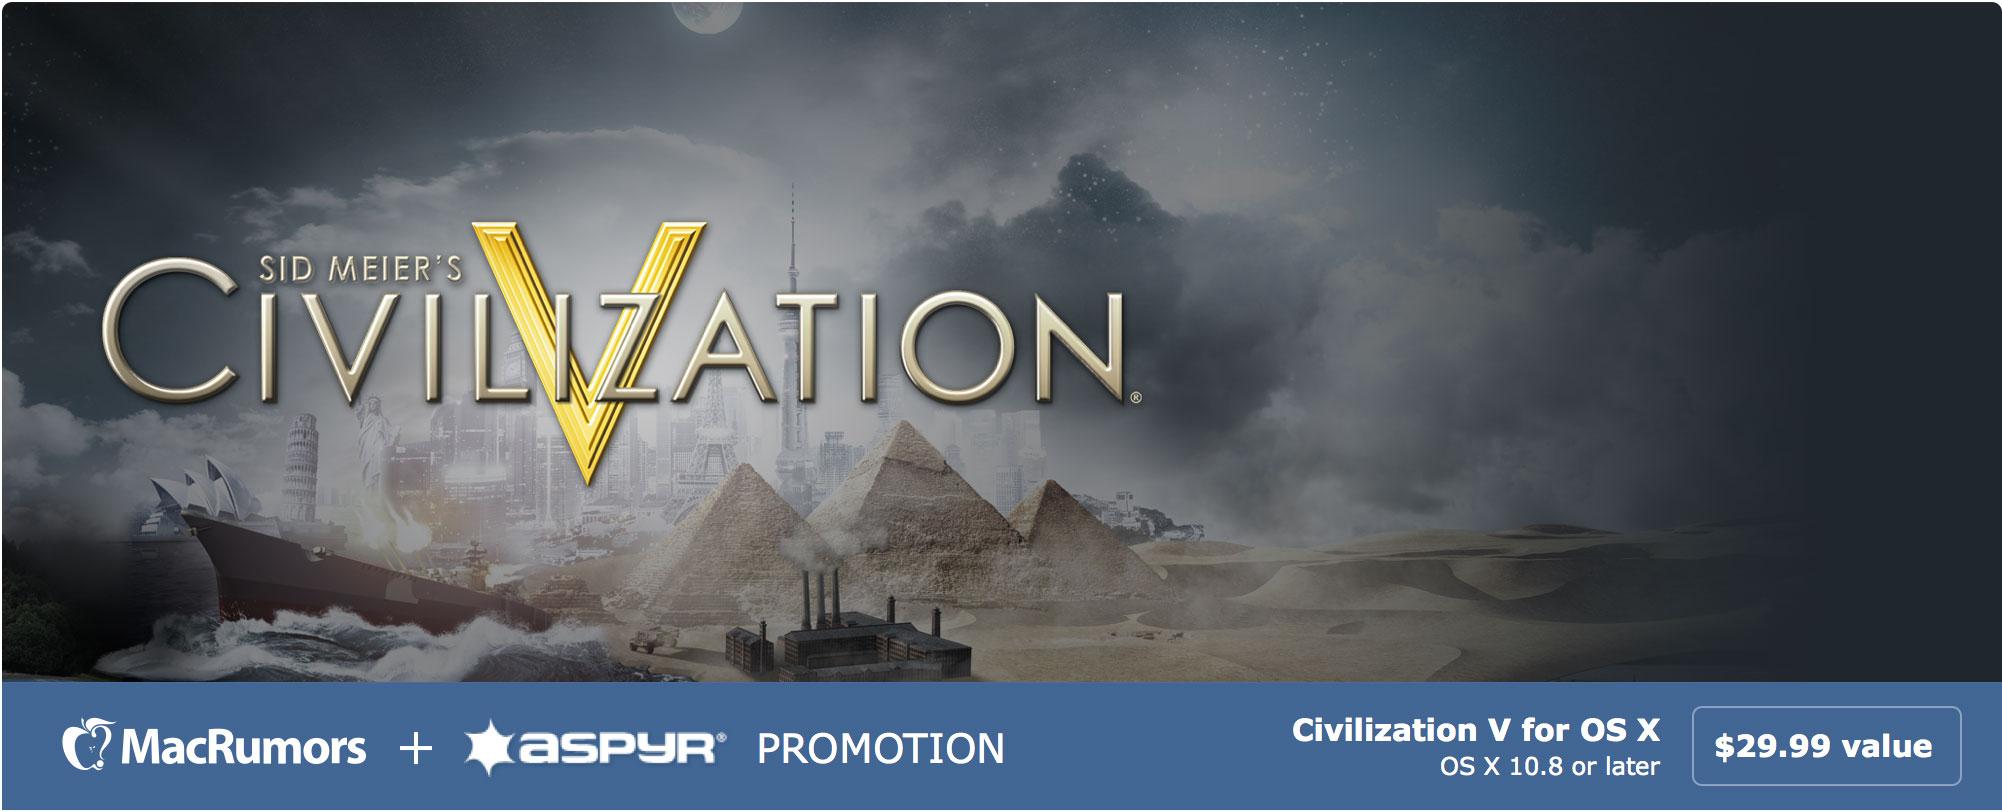 Sid Meier's Civilization V: Campaign Edition para Mac Gratis